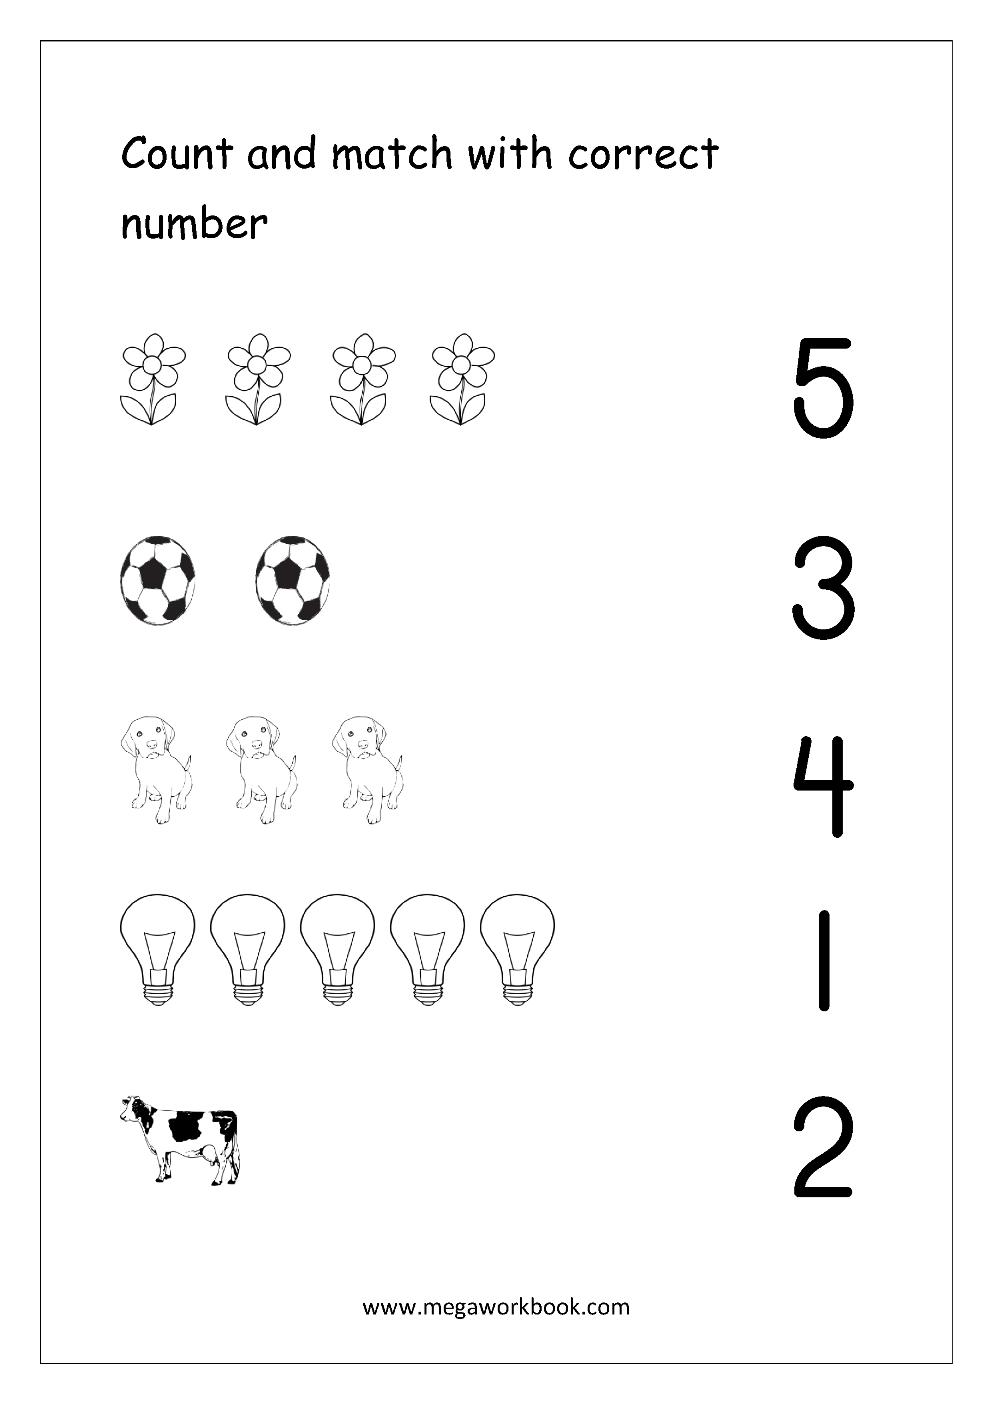 Workbooks number one worksheets : Free Math Worksheets - Number Matching - MegaWorkbook